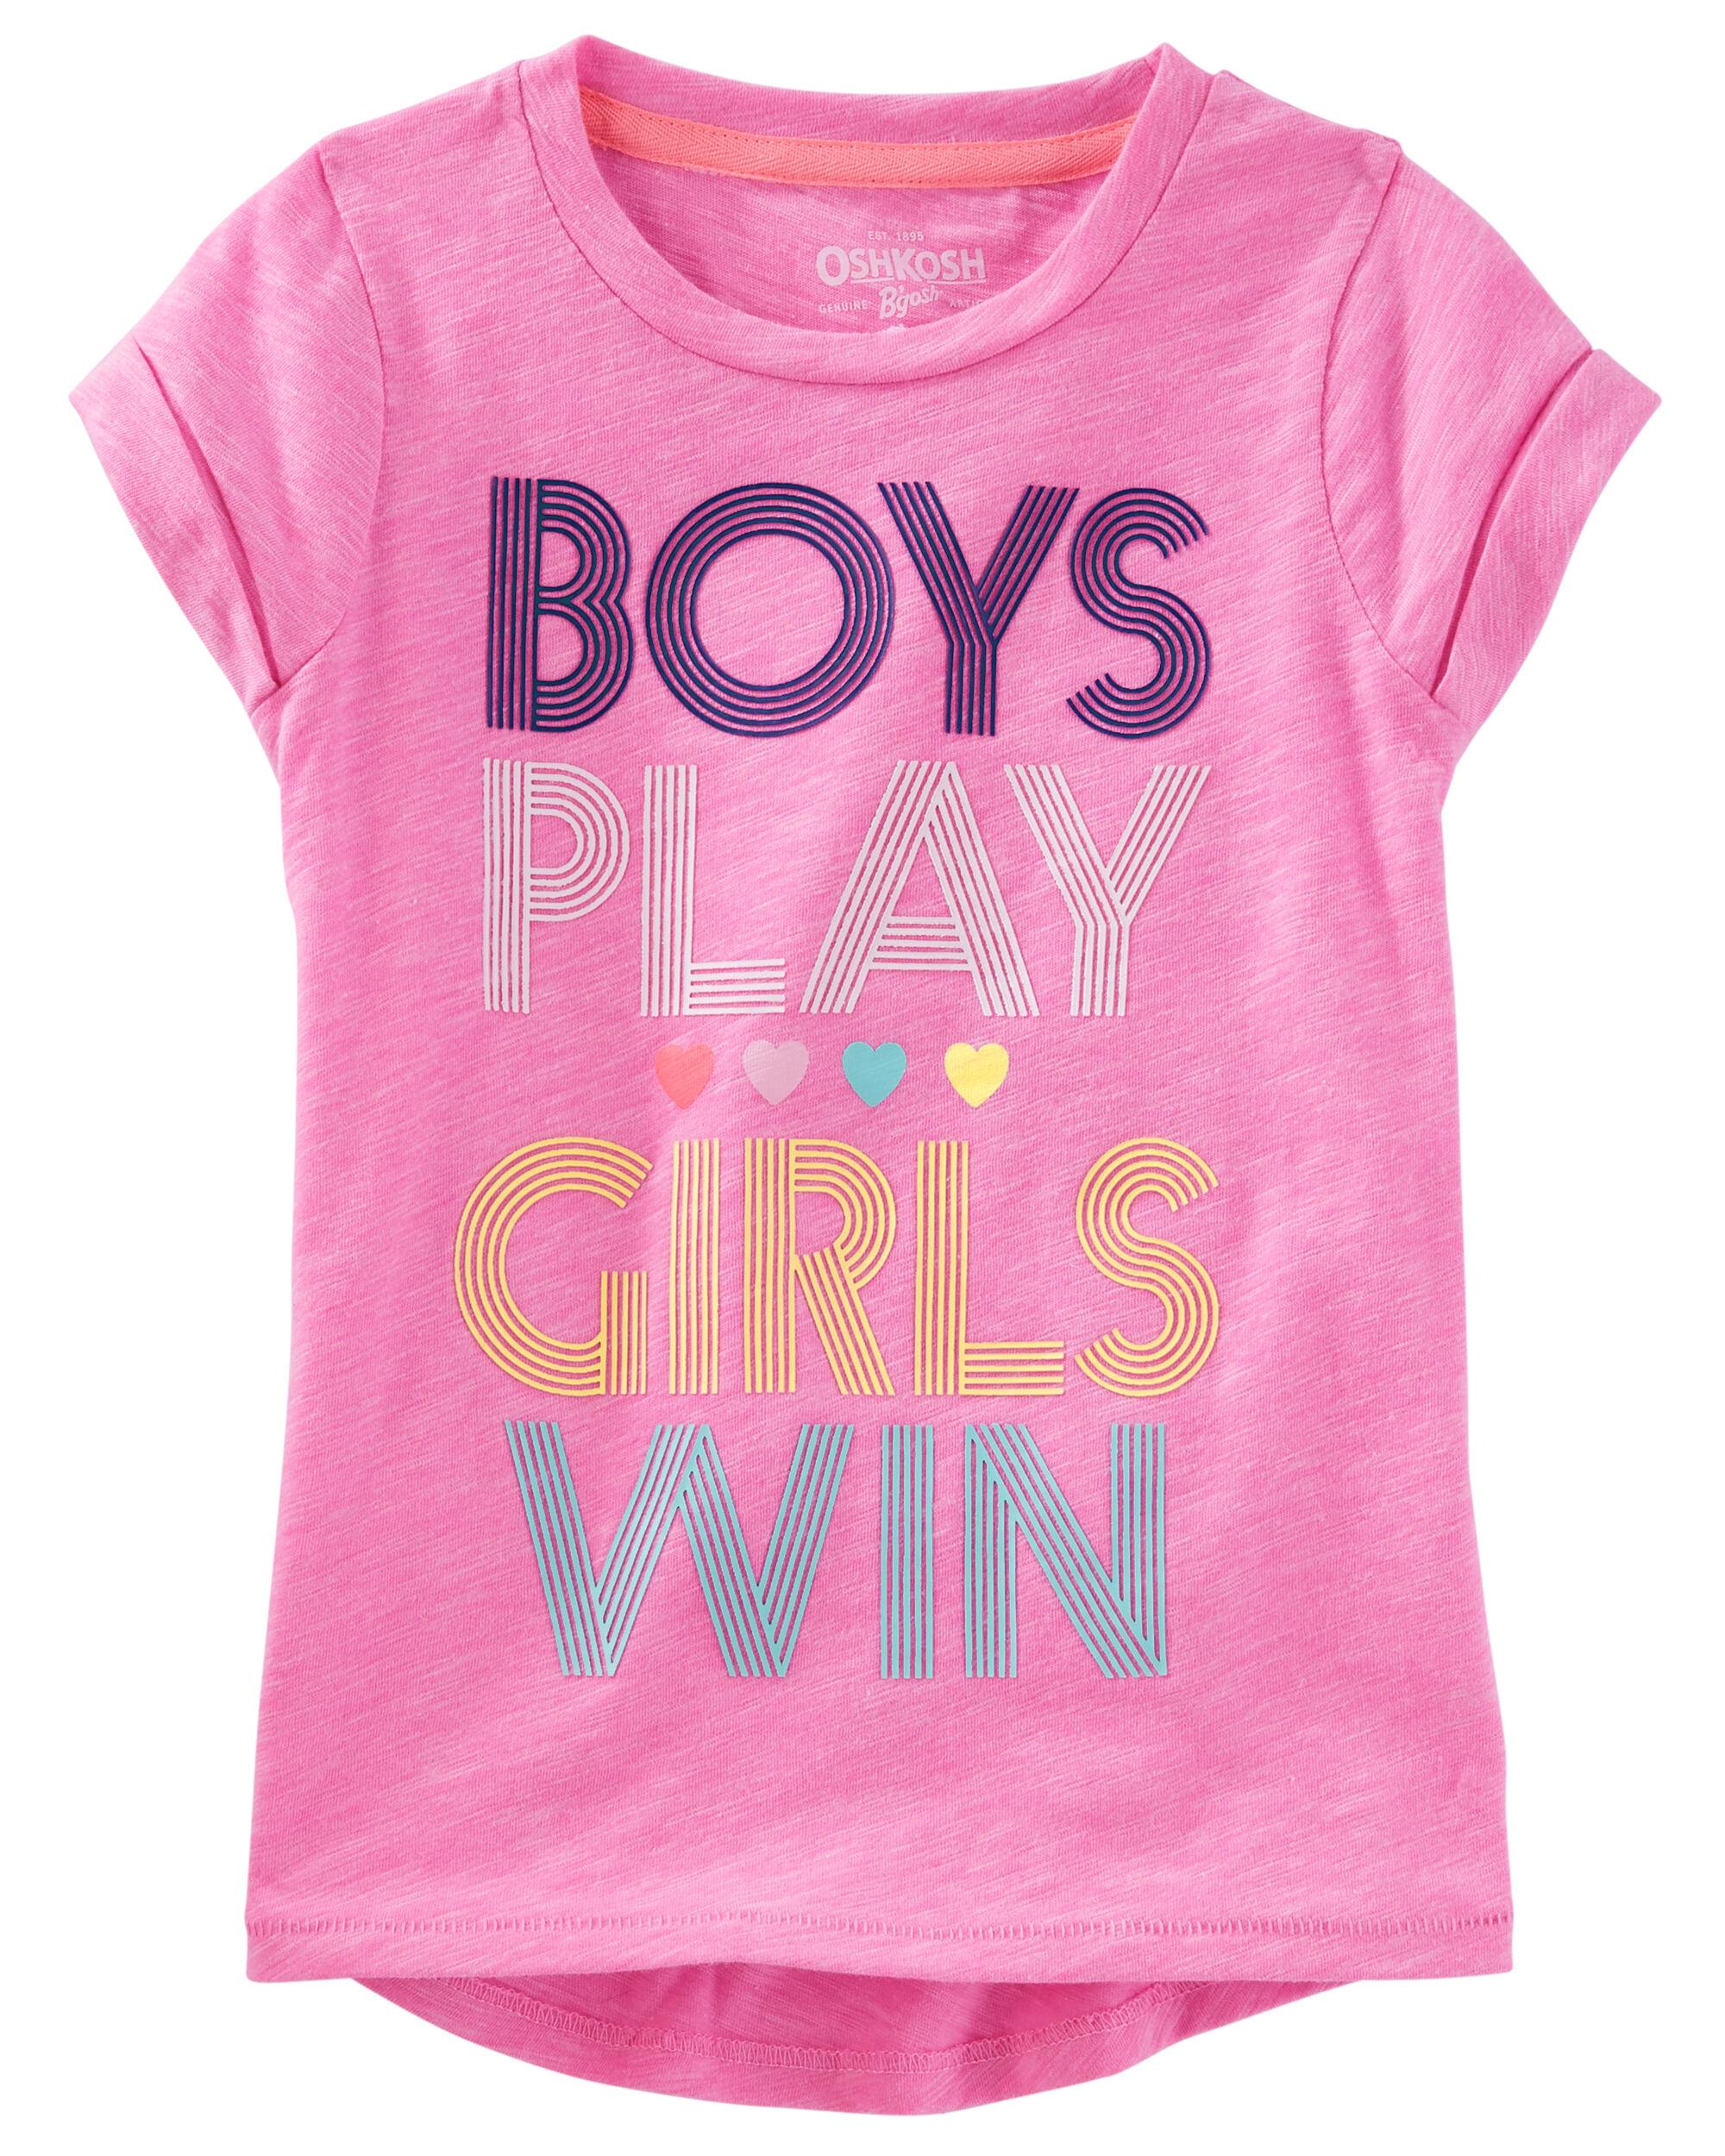 Girls Win Tee